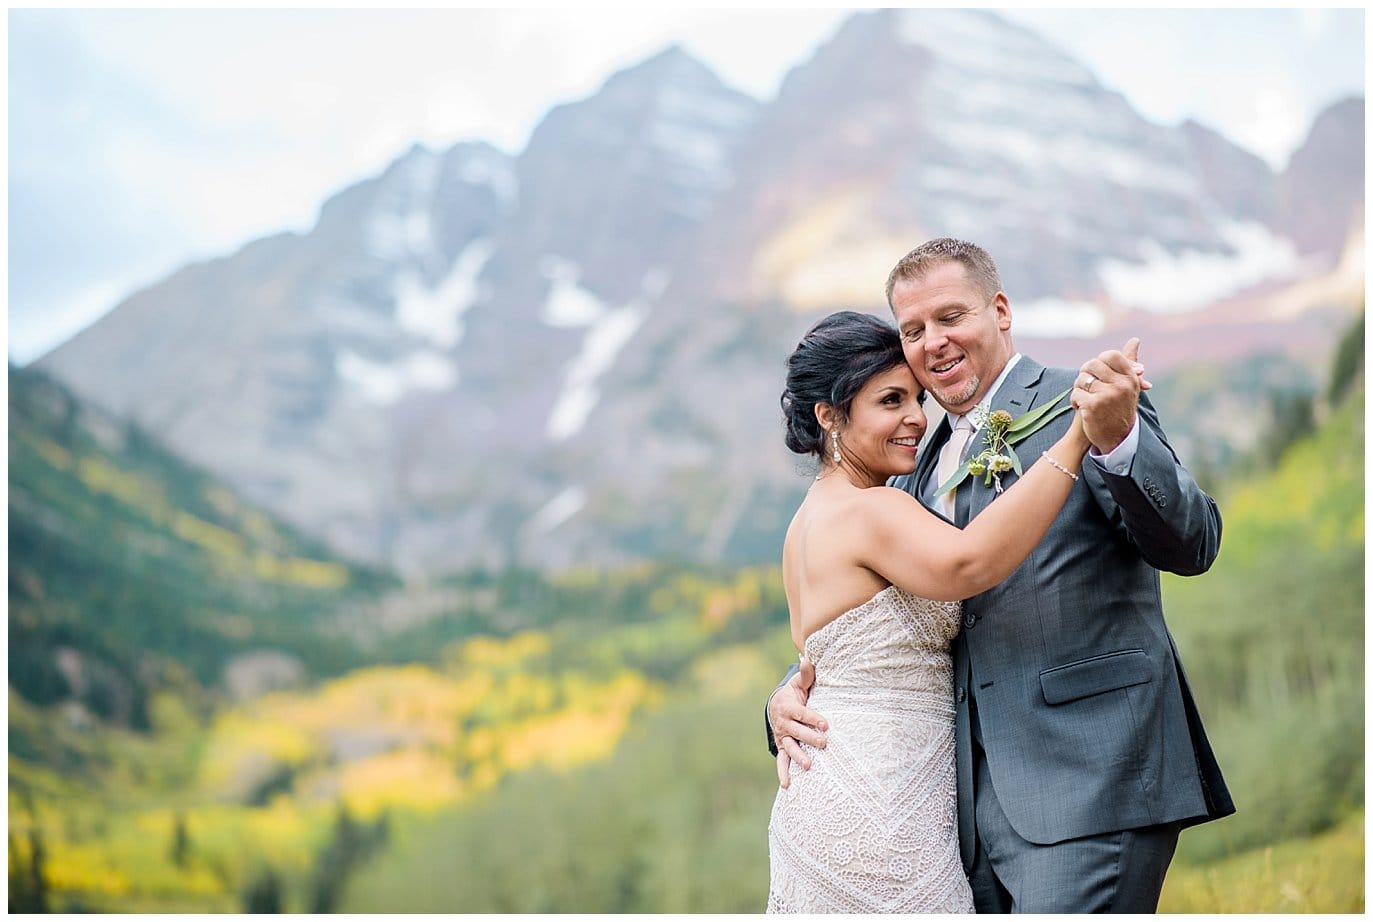 intimate wedding at maroon bells aspen photo